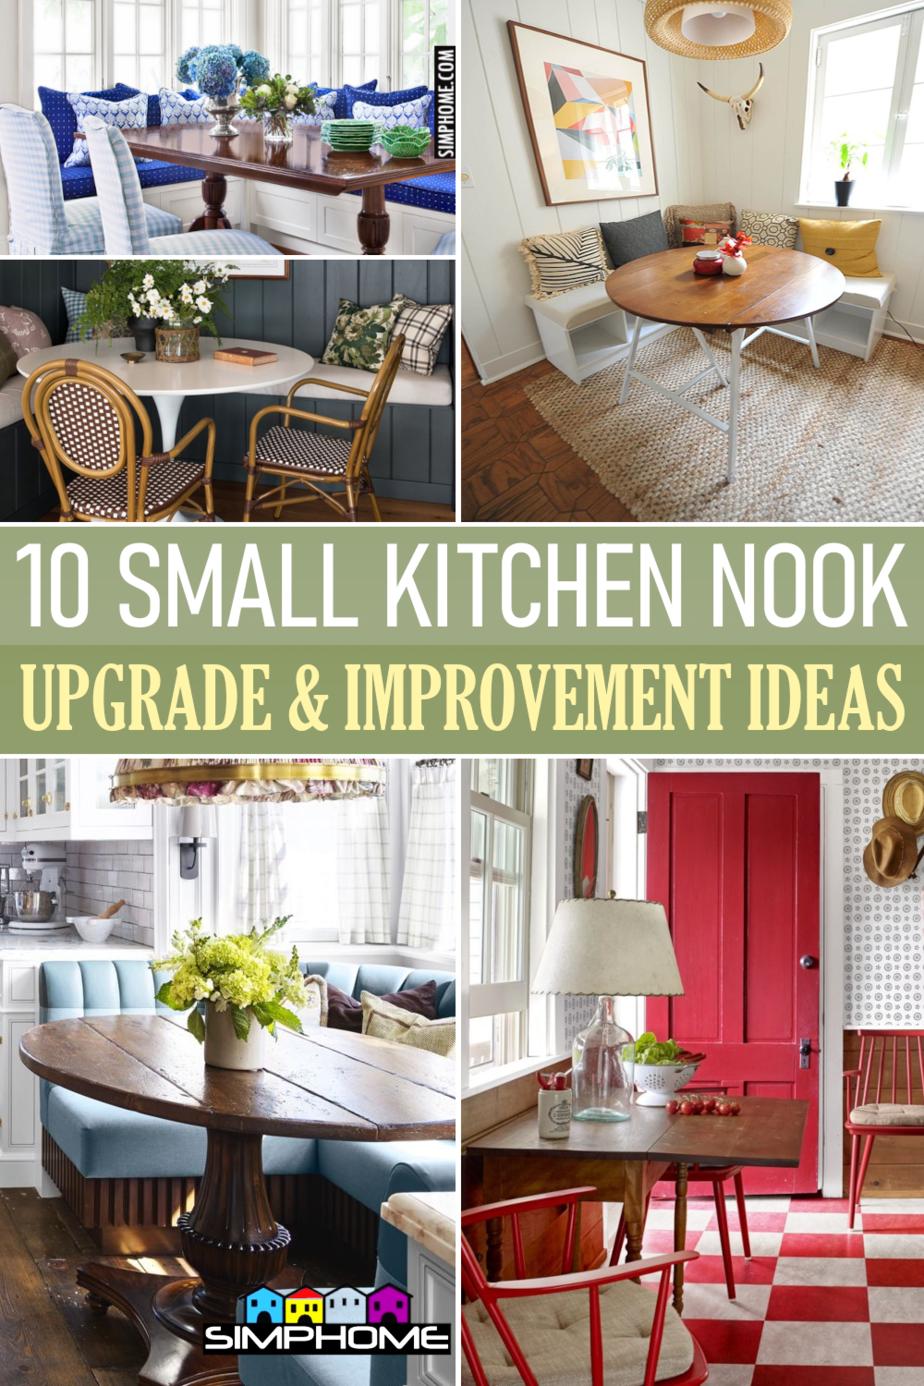 10 Small Kitchen Nook Ideas via Simphome.comFeatured Image